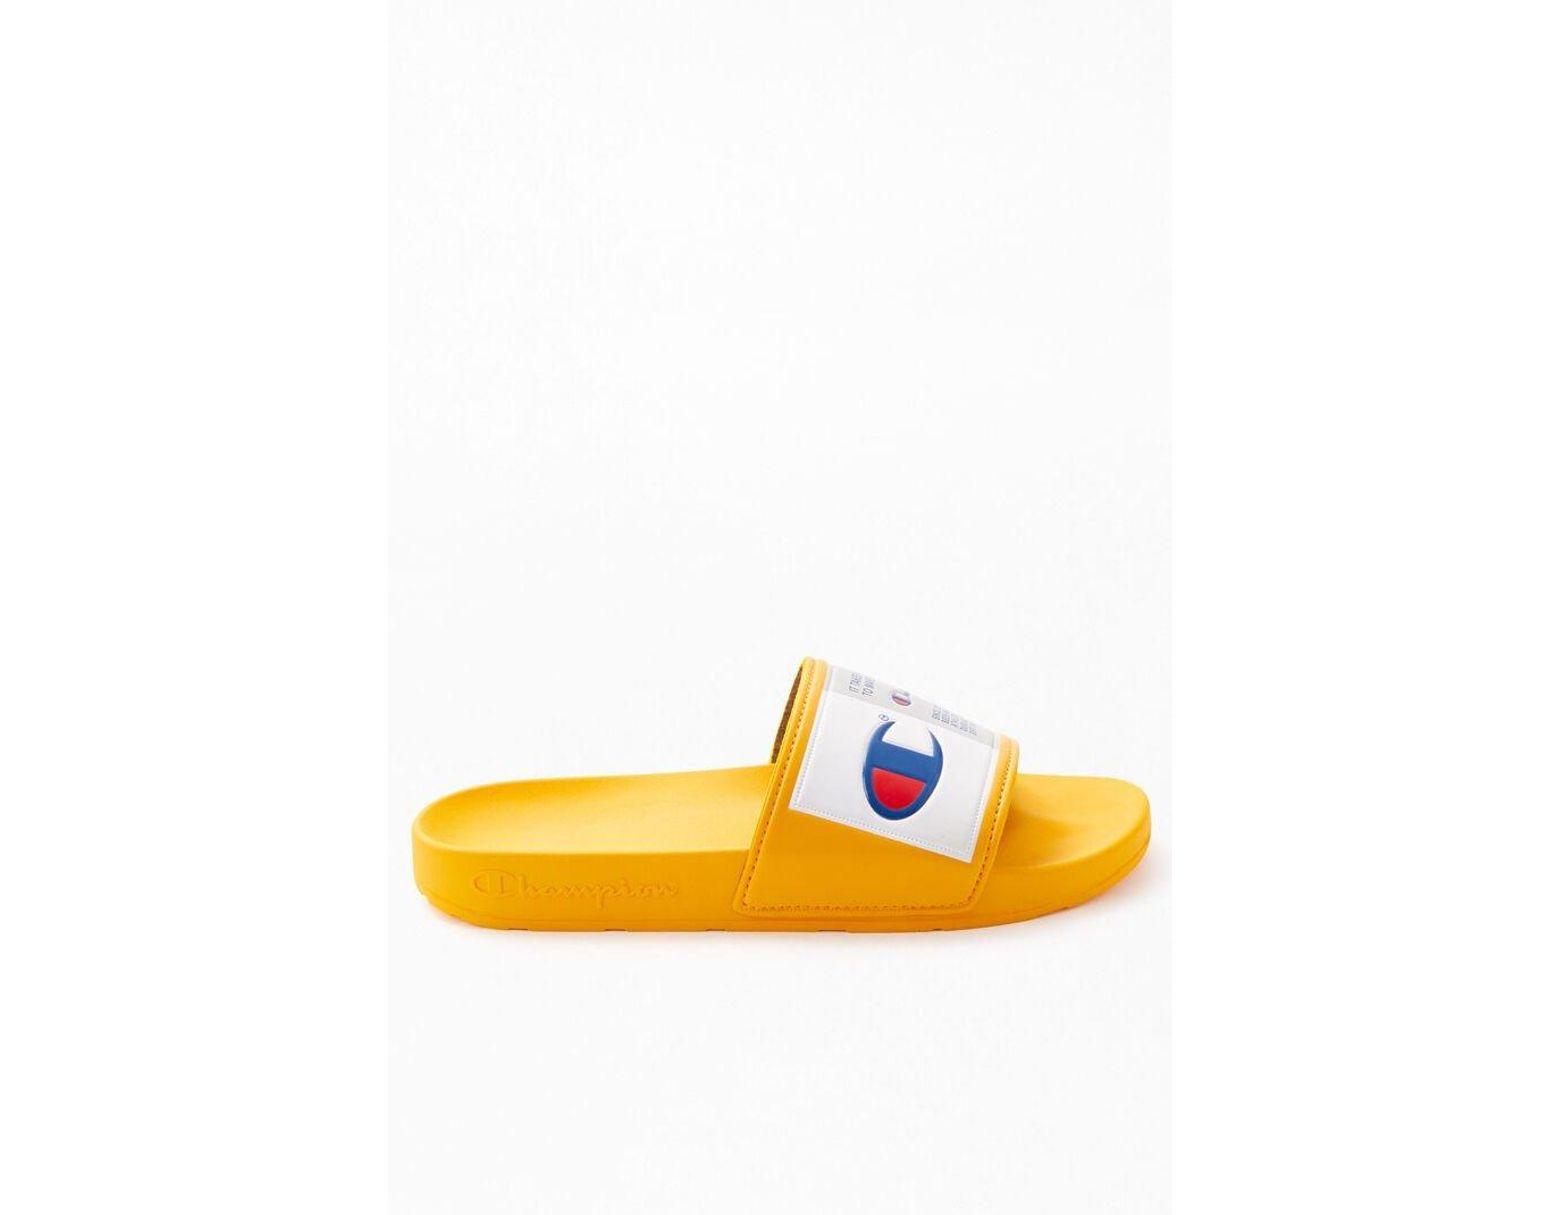 Gold Ipo Slide Men's C Jock Sandals Metallic 4LR5Aq3j